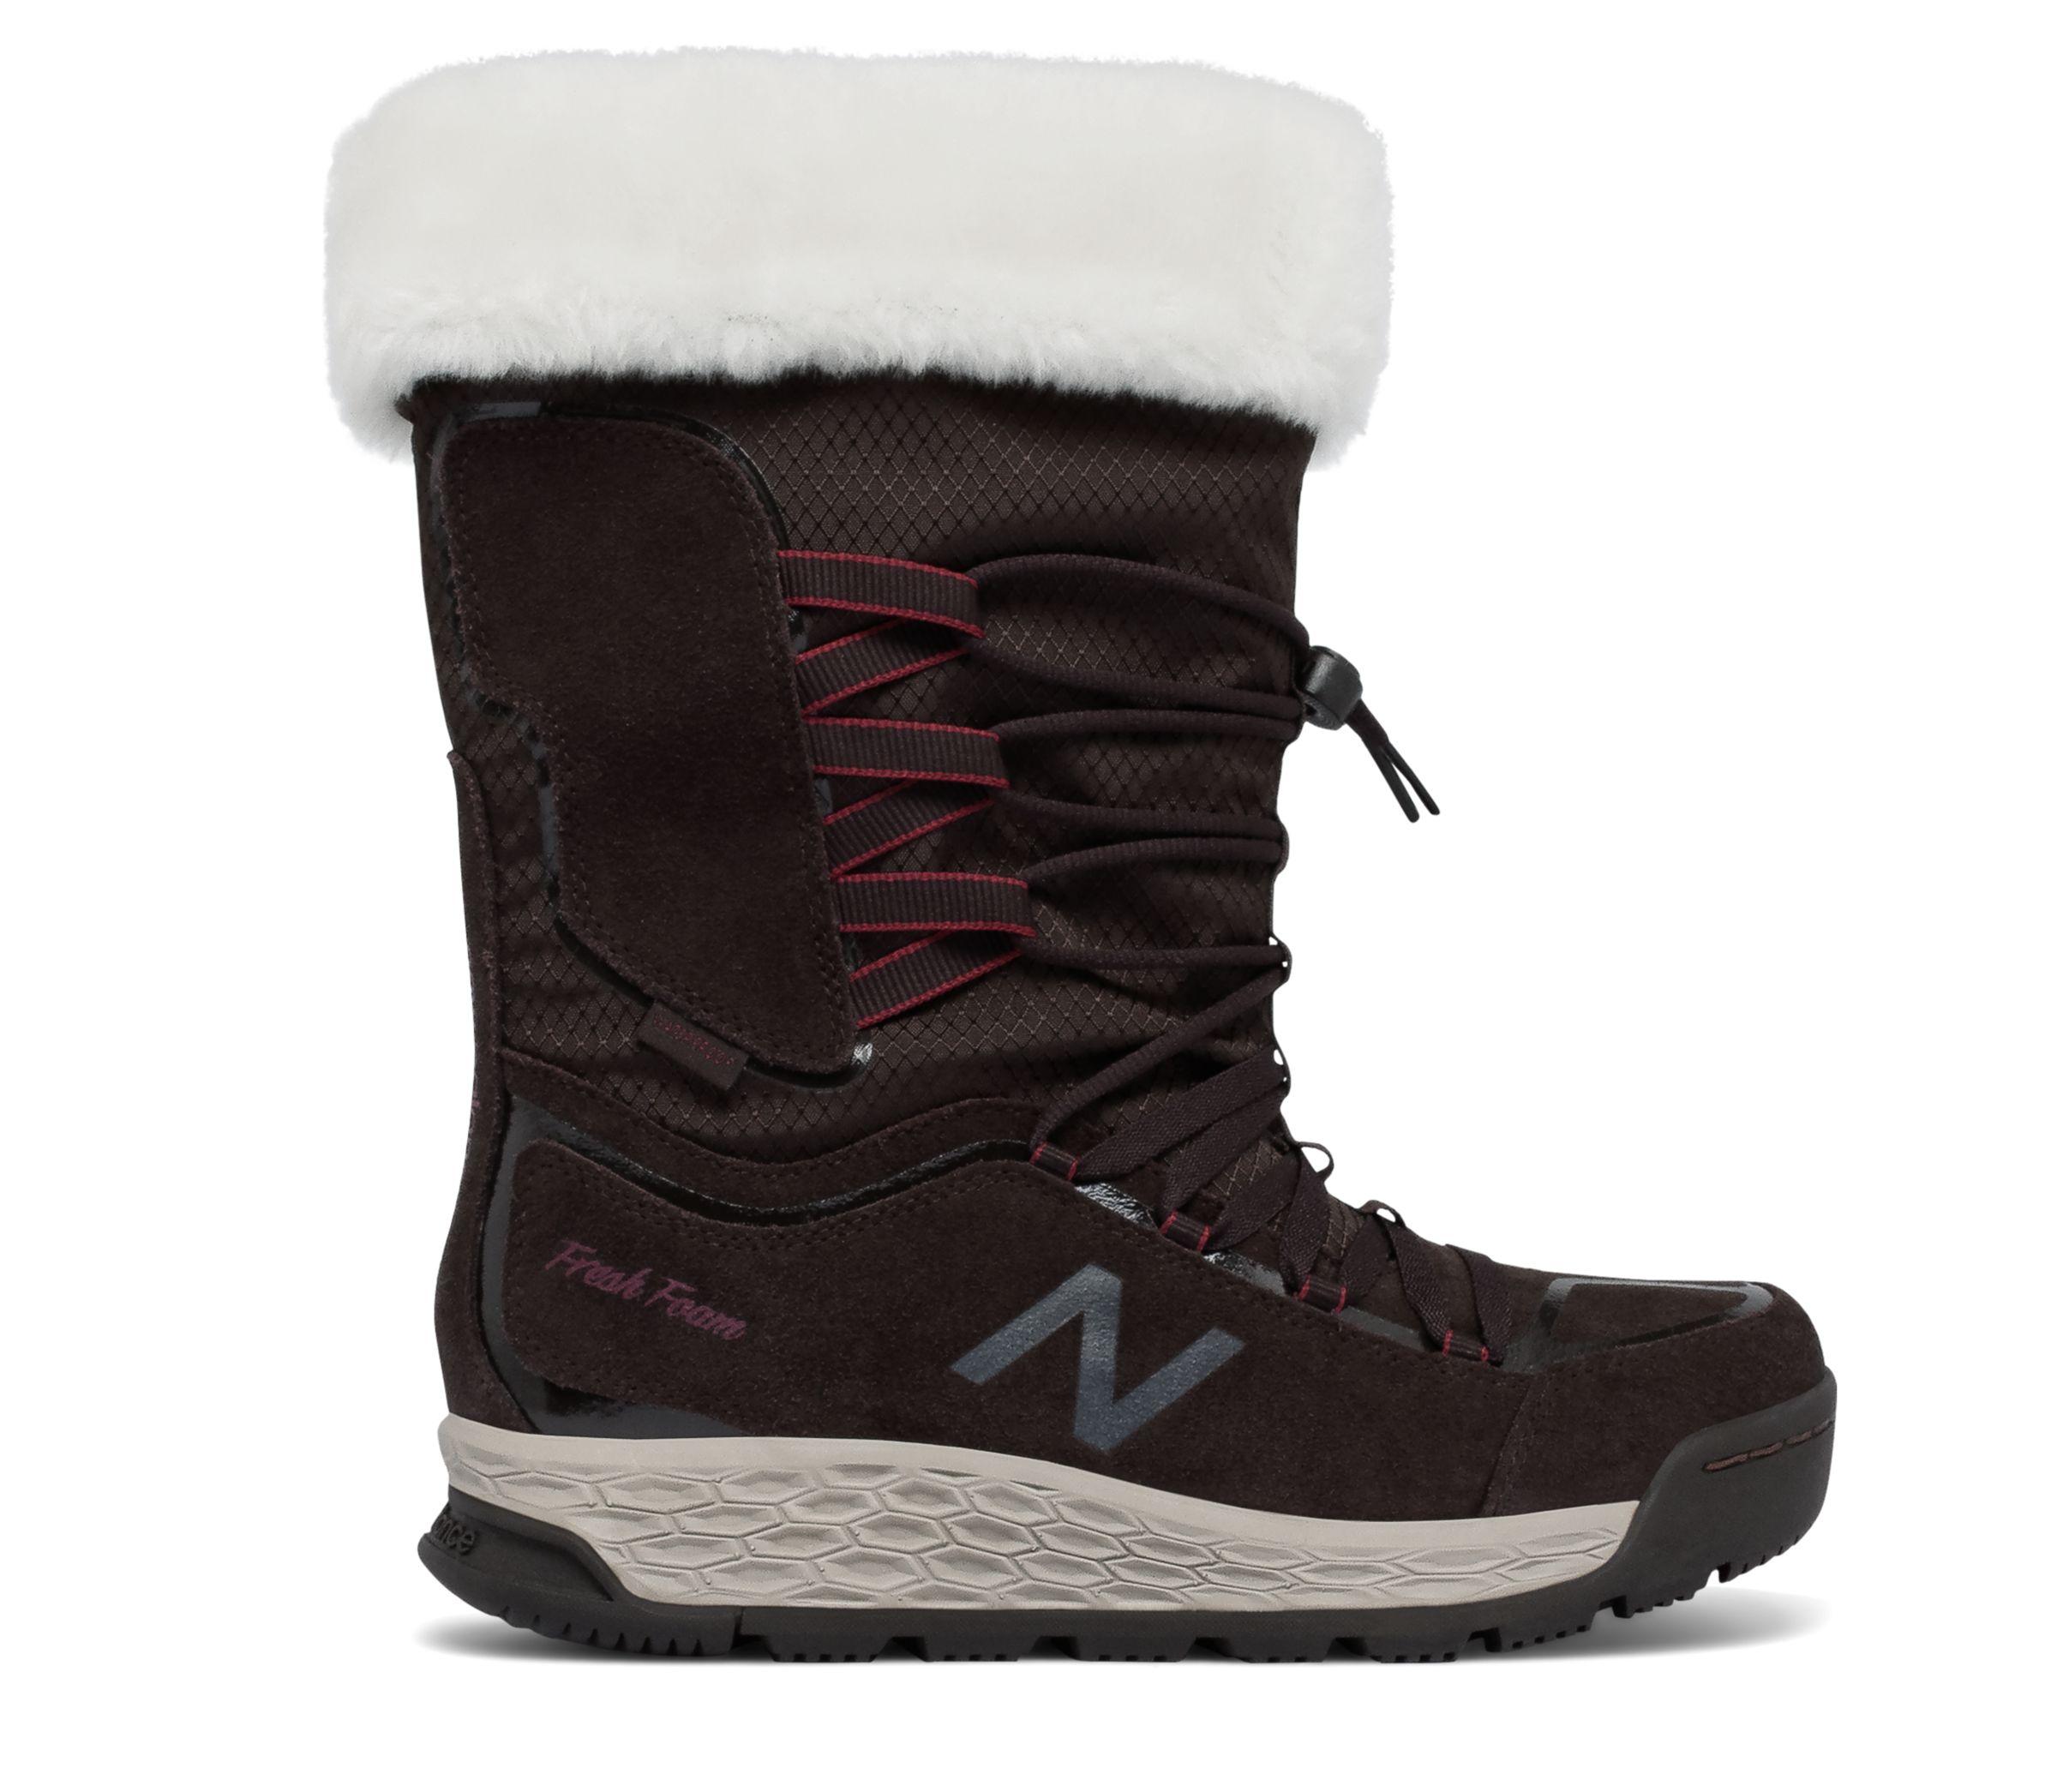 NB Fresh Foam 1000 Boot, Brown with Sedona